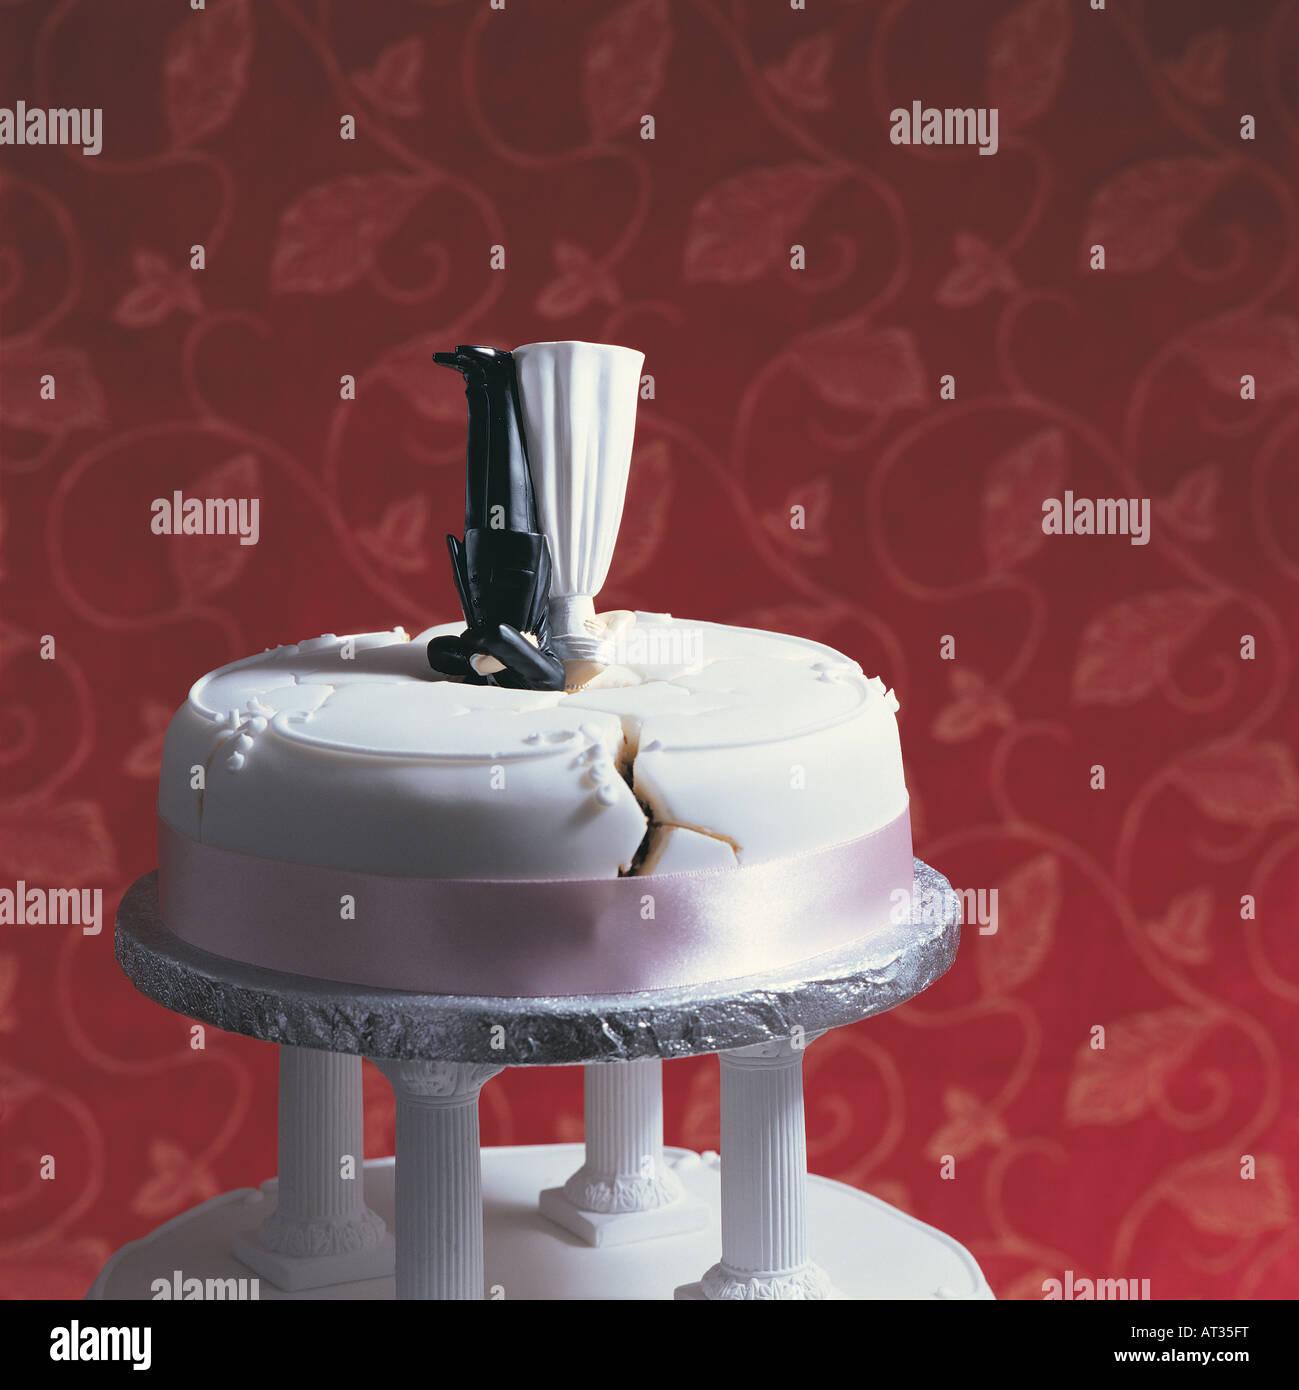 Icing A Broken Cake